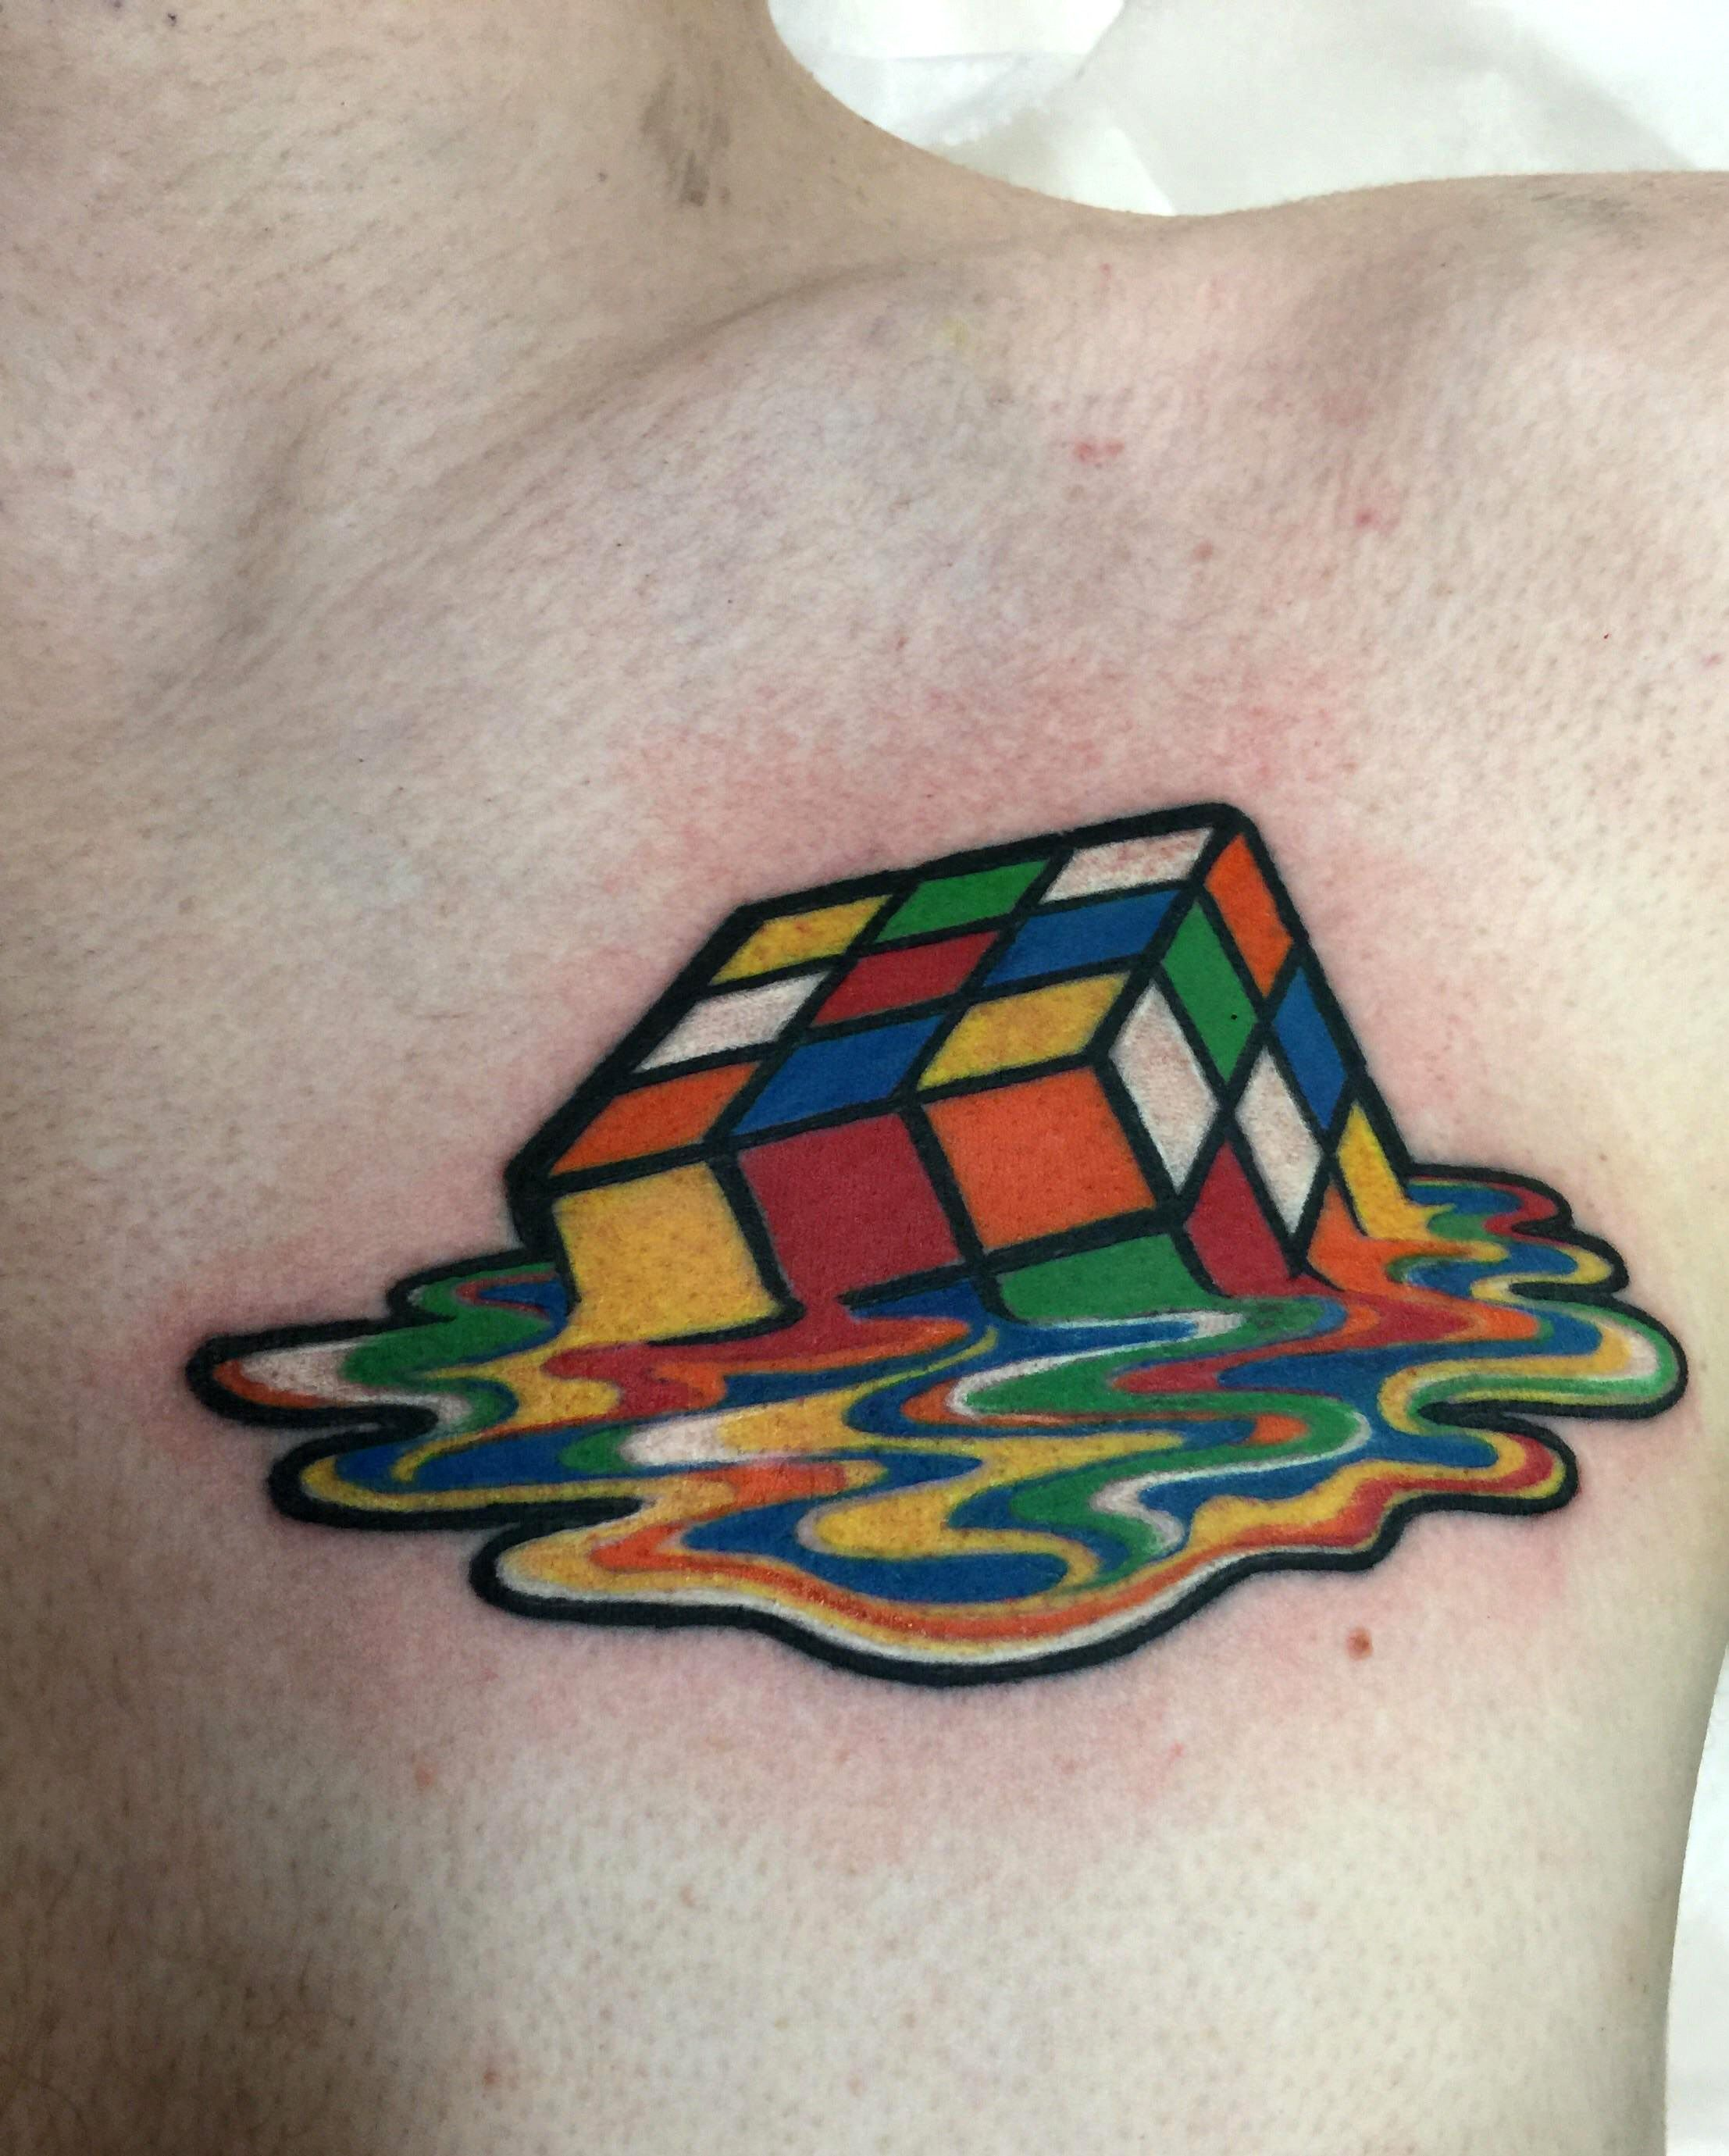 Melting rubiks cube tattoo by laetitia at angel tattoos in